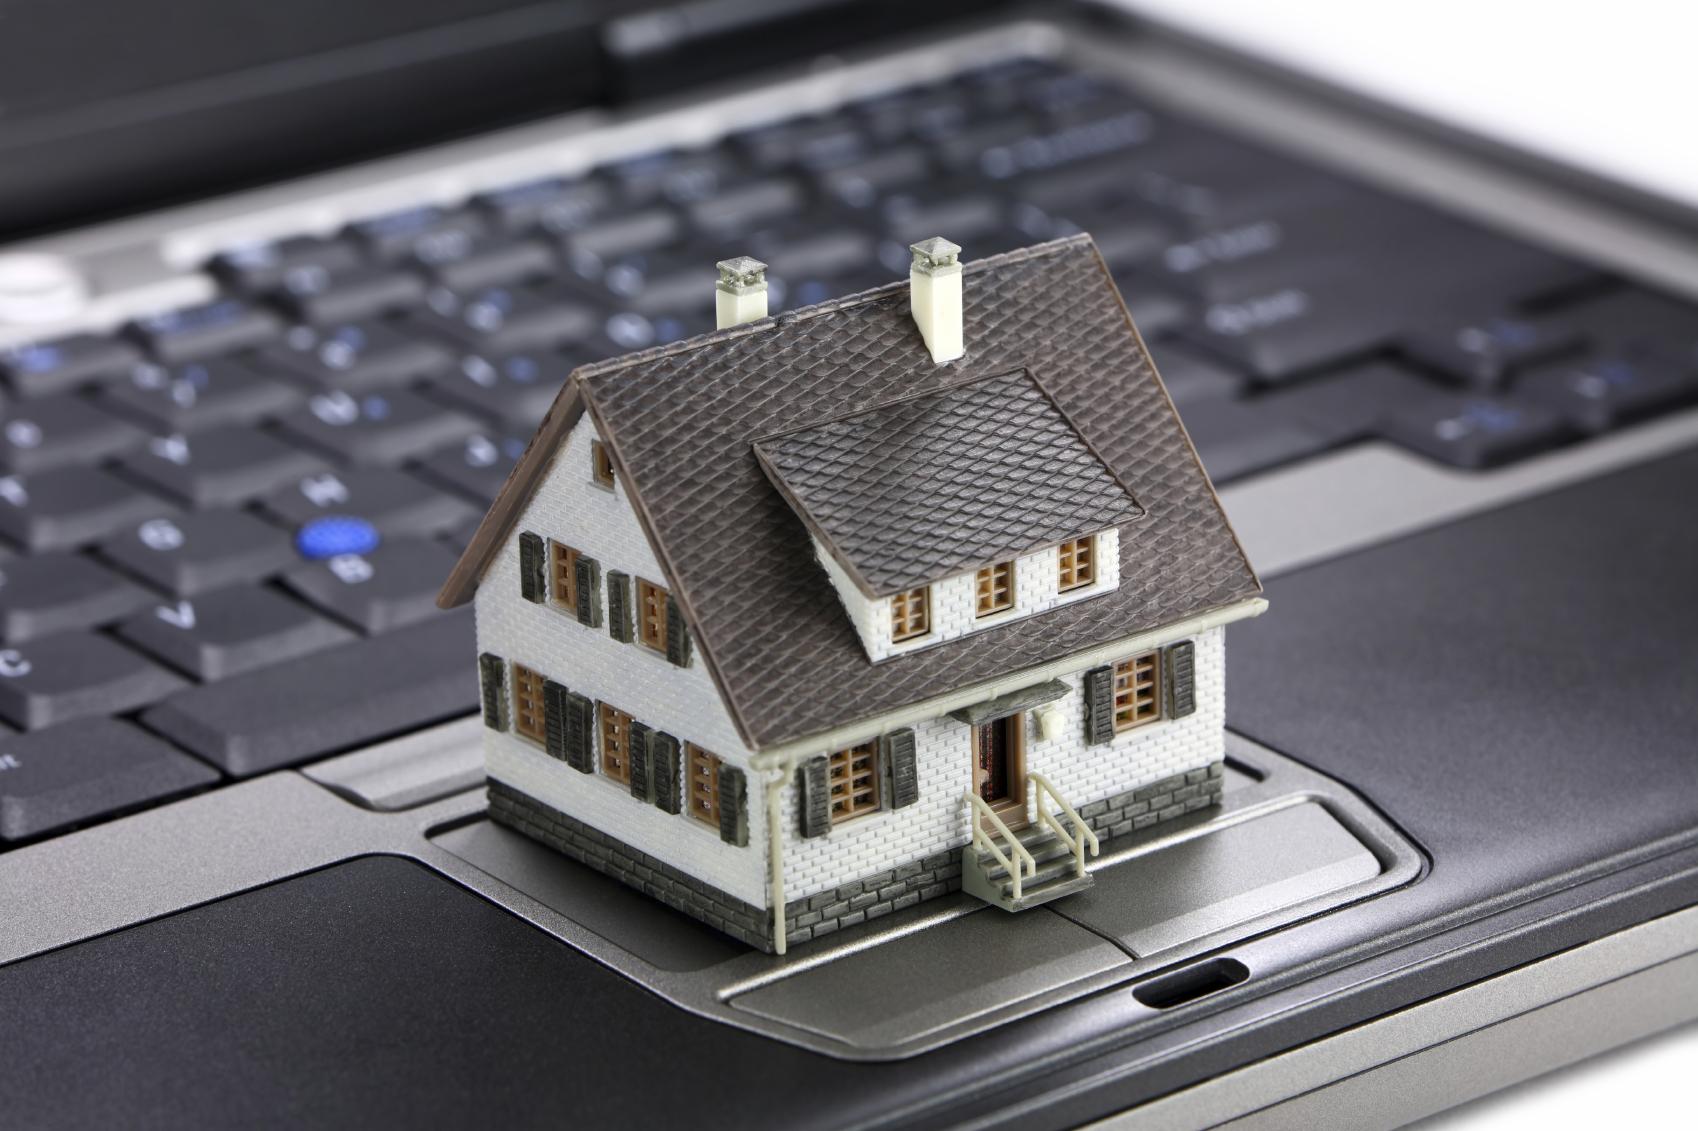 Multi-family/HOA Property Management Software